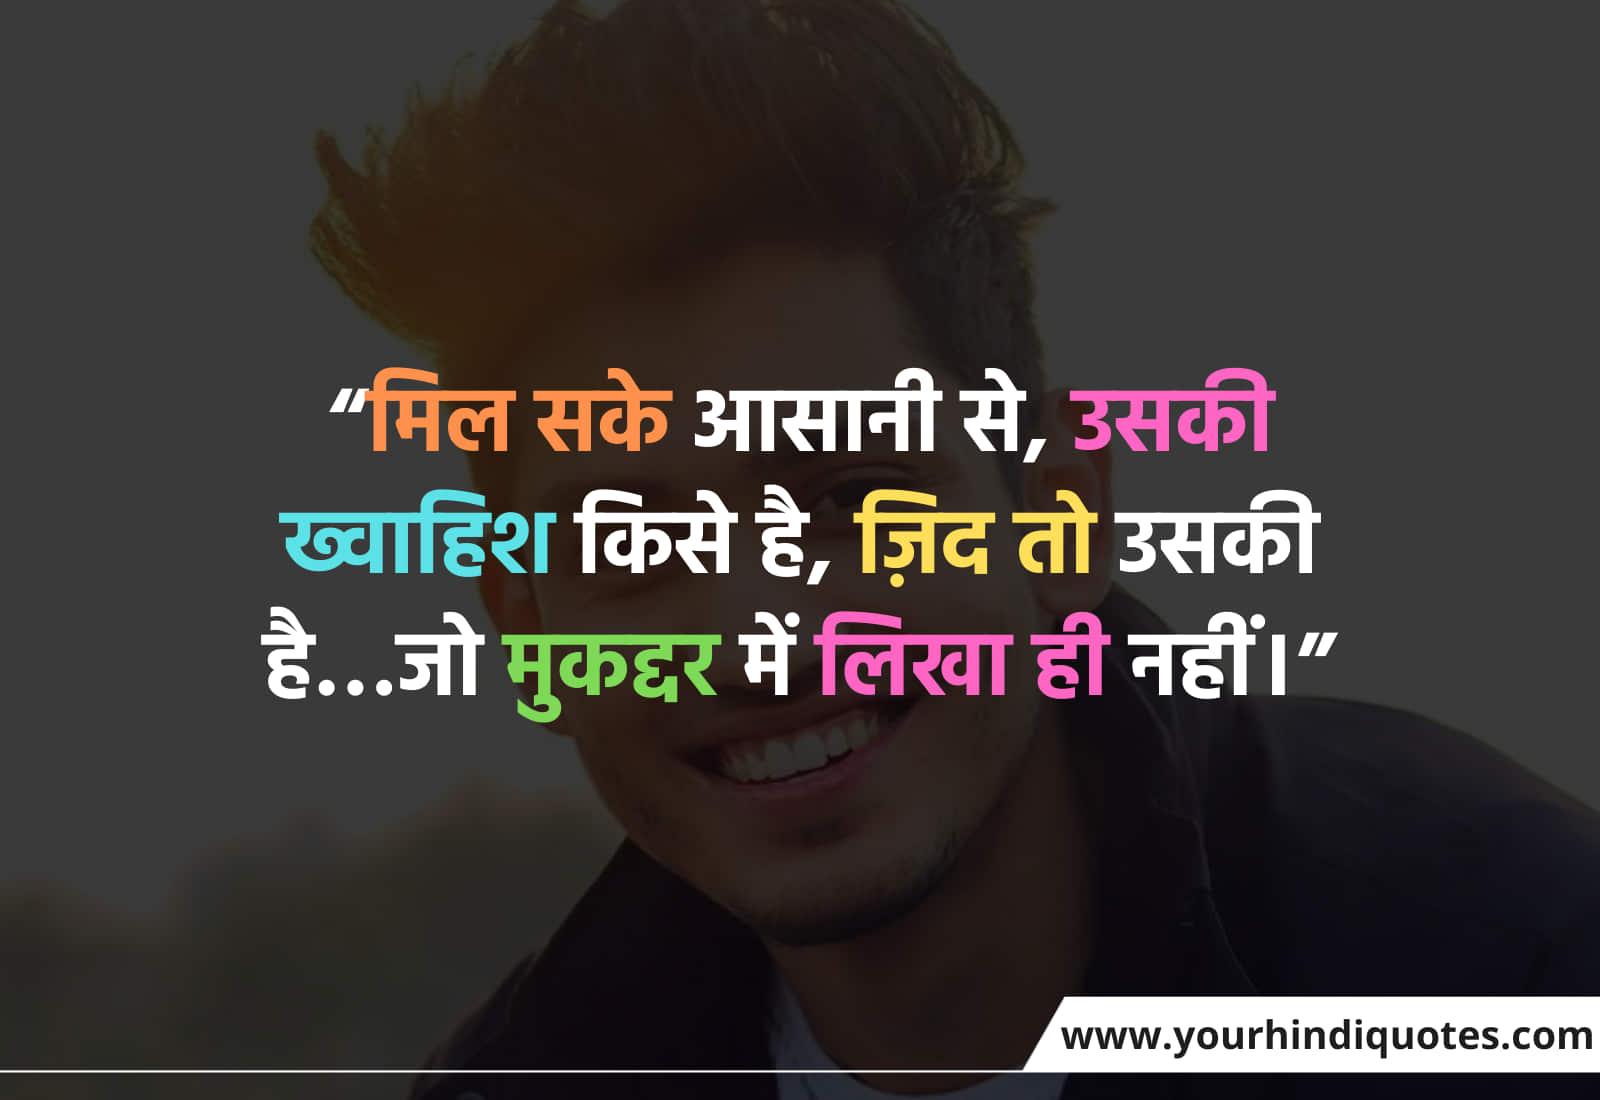 Hindi Sad WhatsApp Status